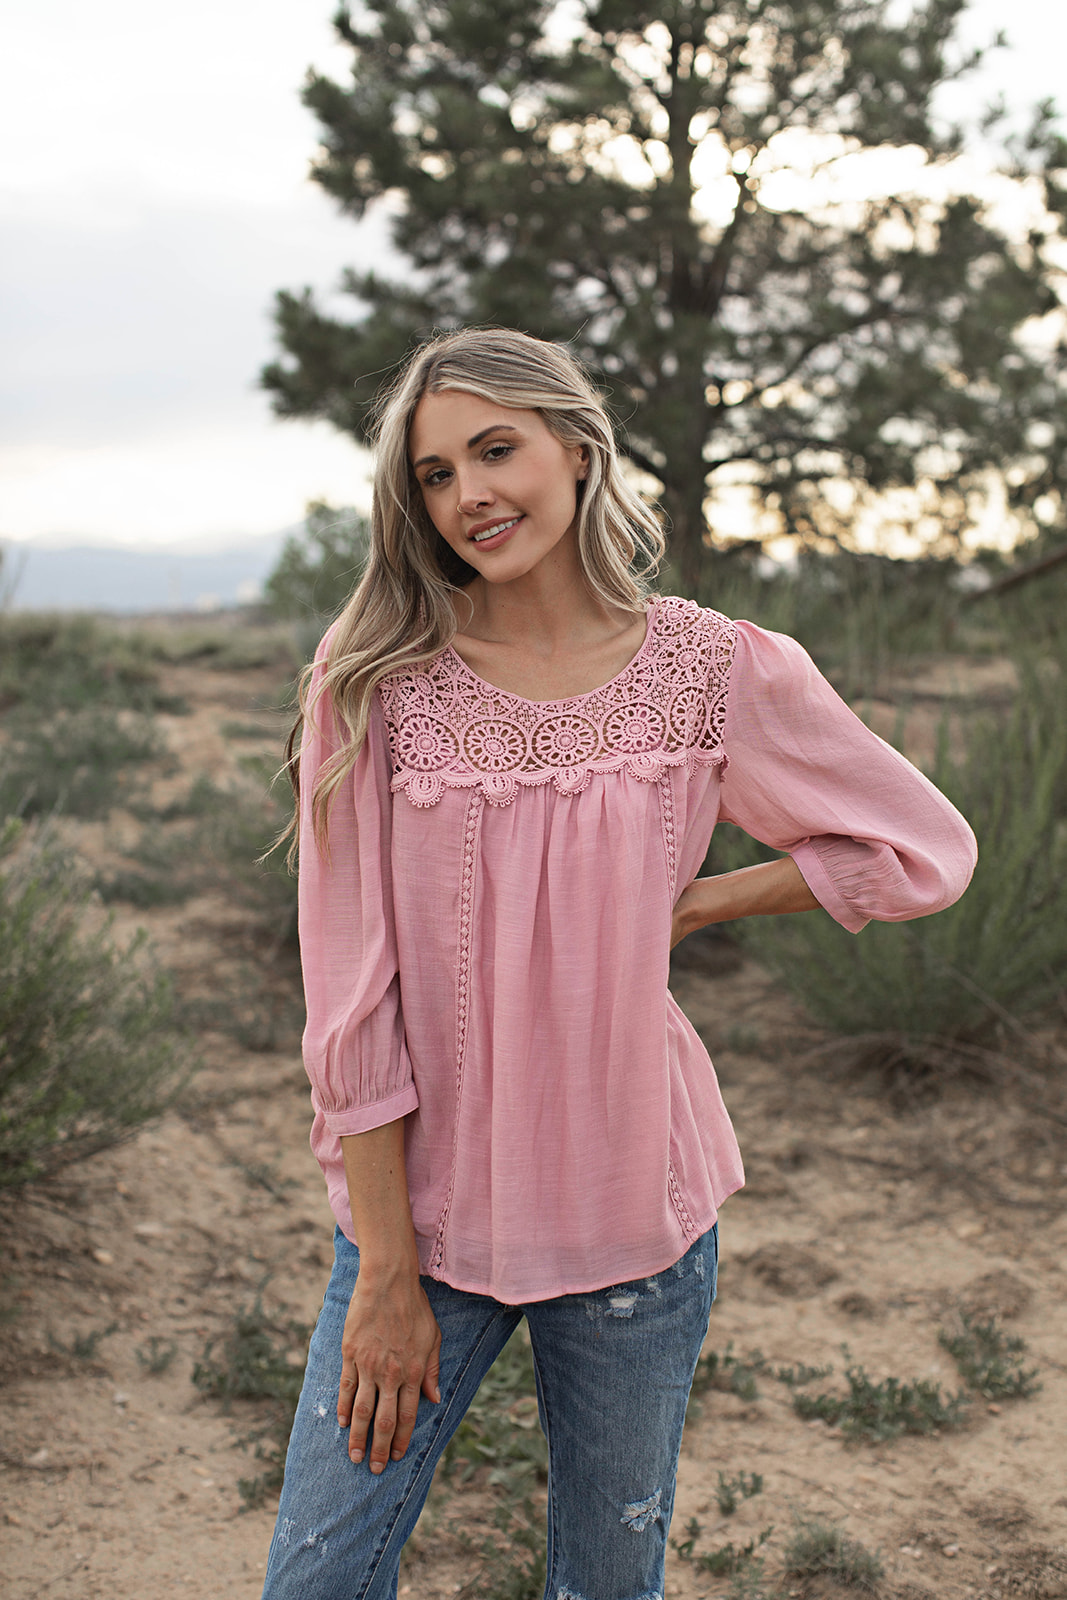 Crochet Textured Blouse - Blush - Front